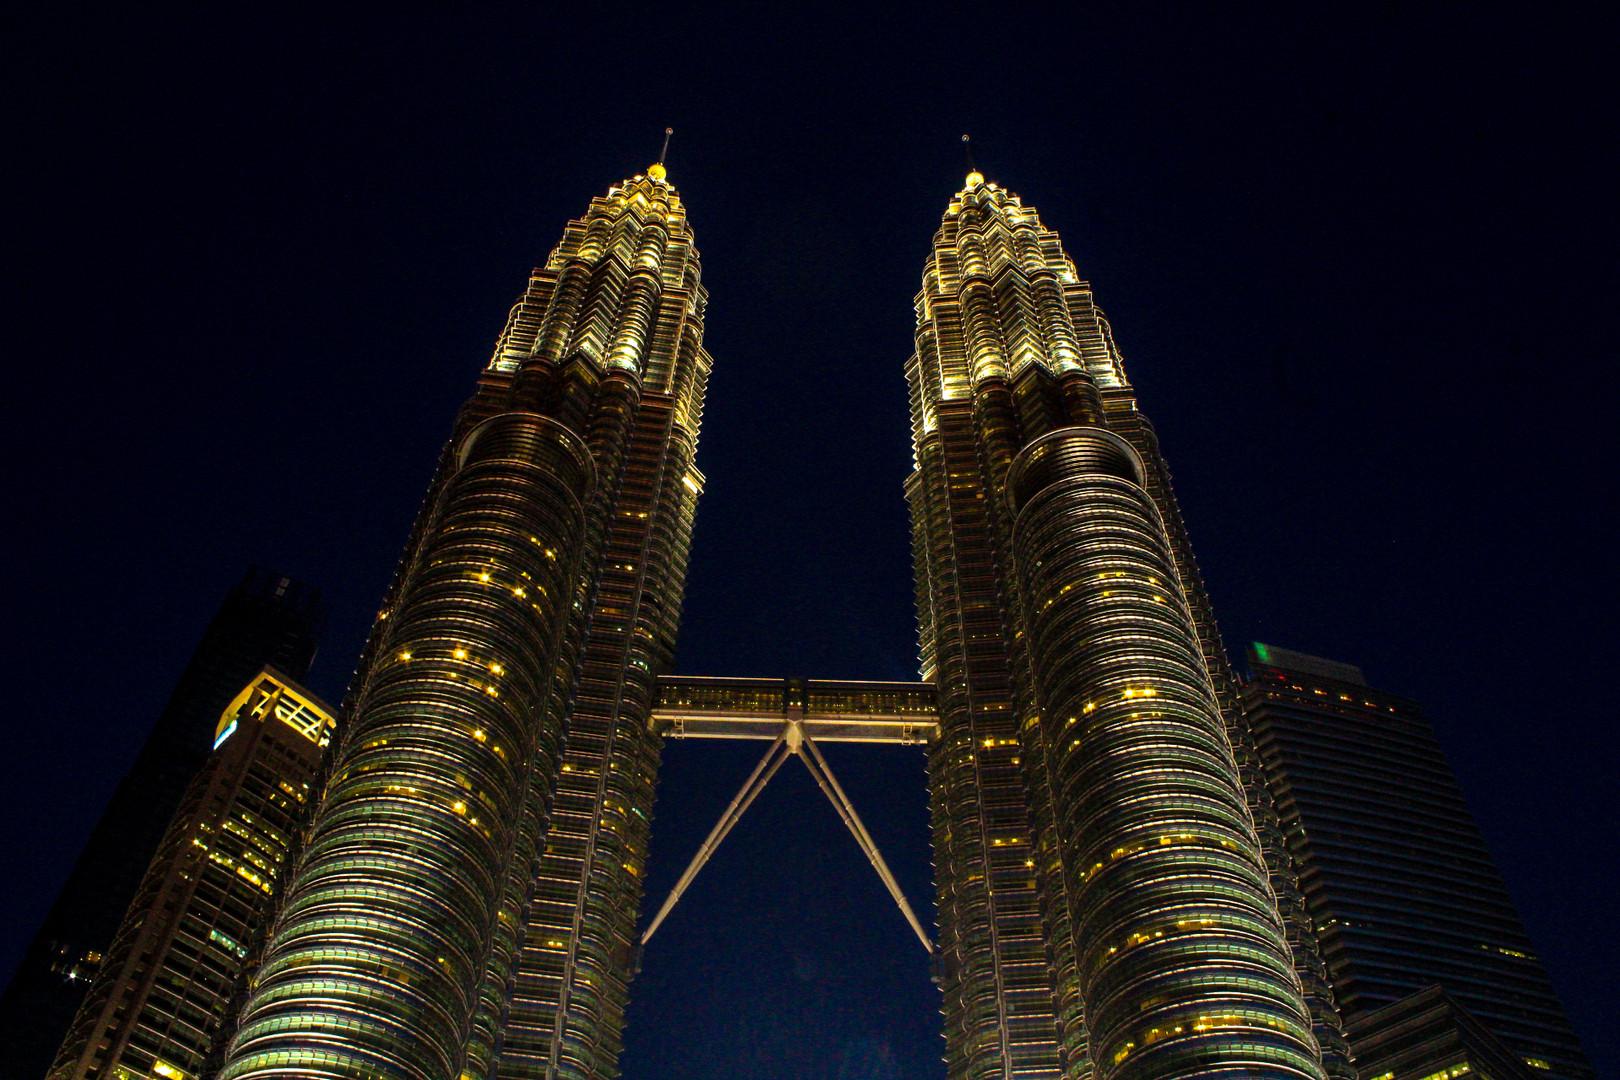 Les tour jumelle de Kuala Lumpur